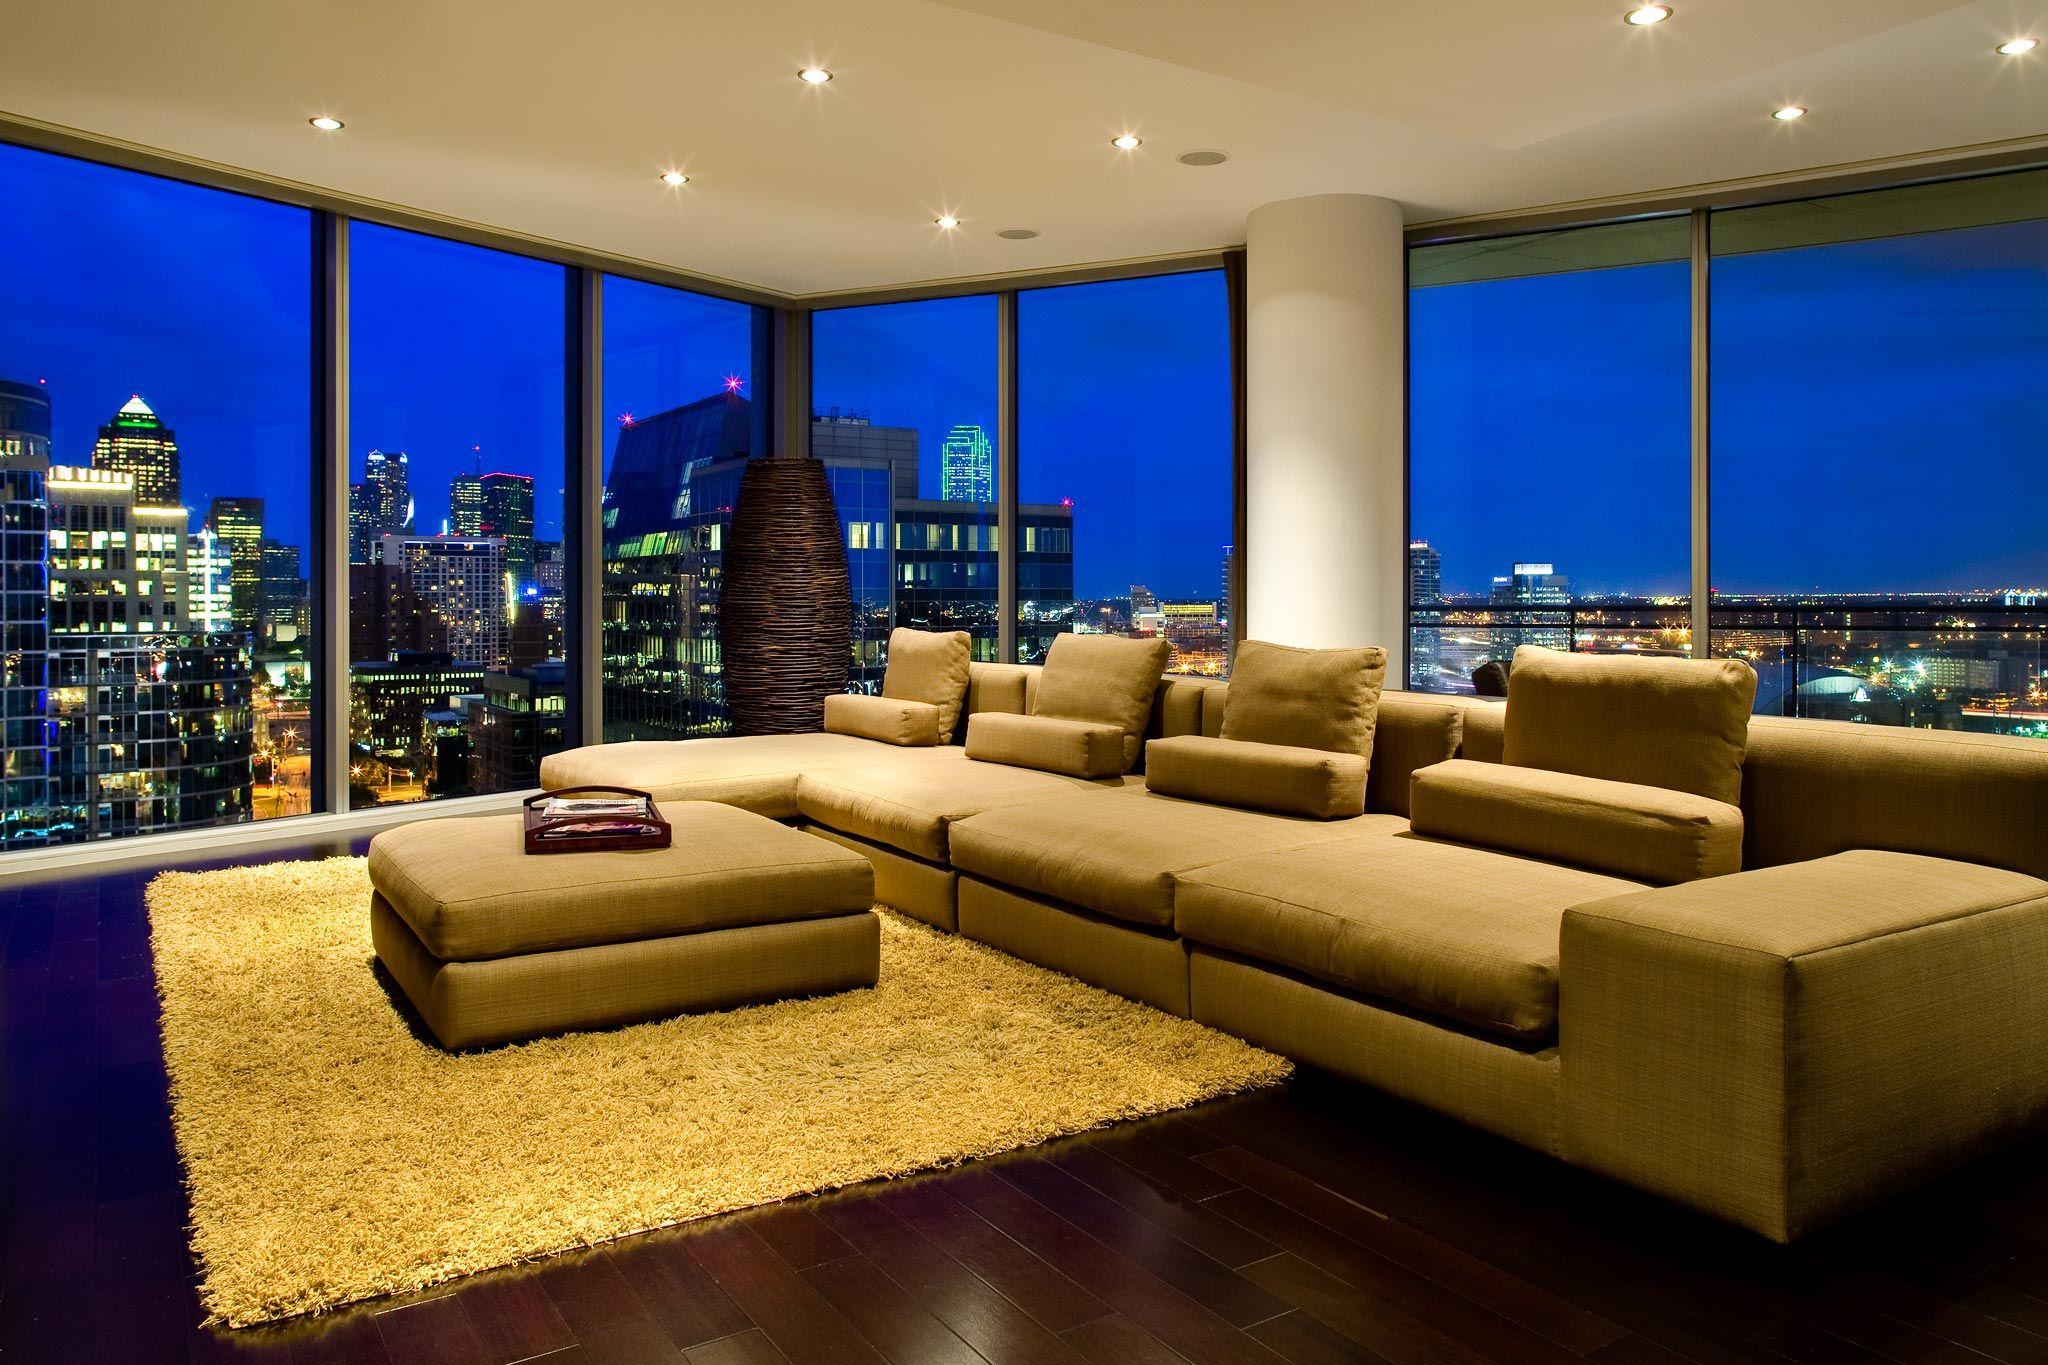 Highrise luxury condo living room design ideas city view